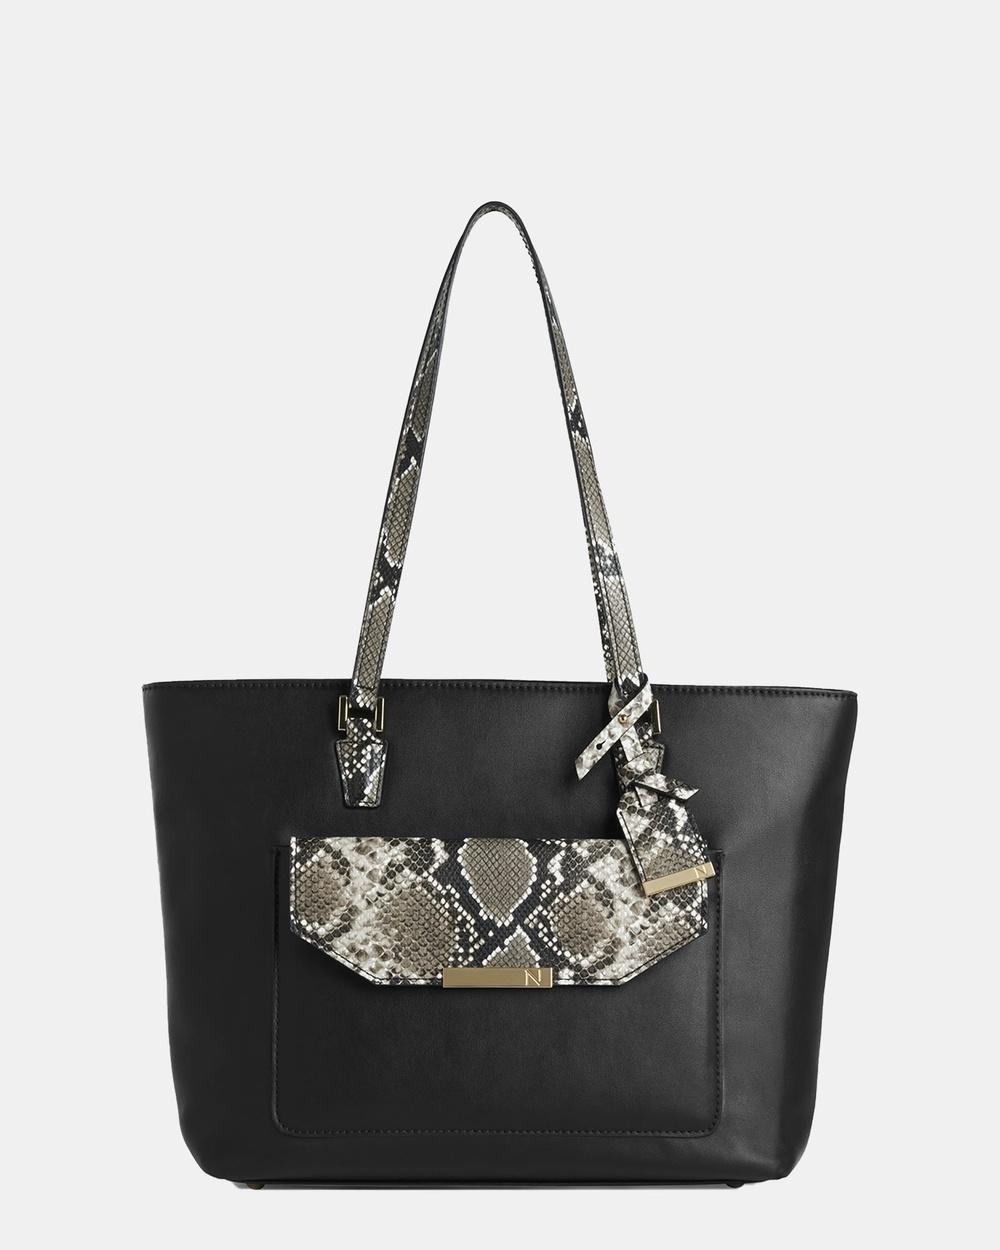 Naturalizer Dylana Tote Bag Bags Black Snake Australia